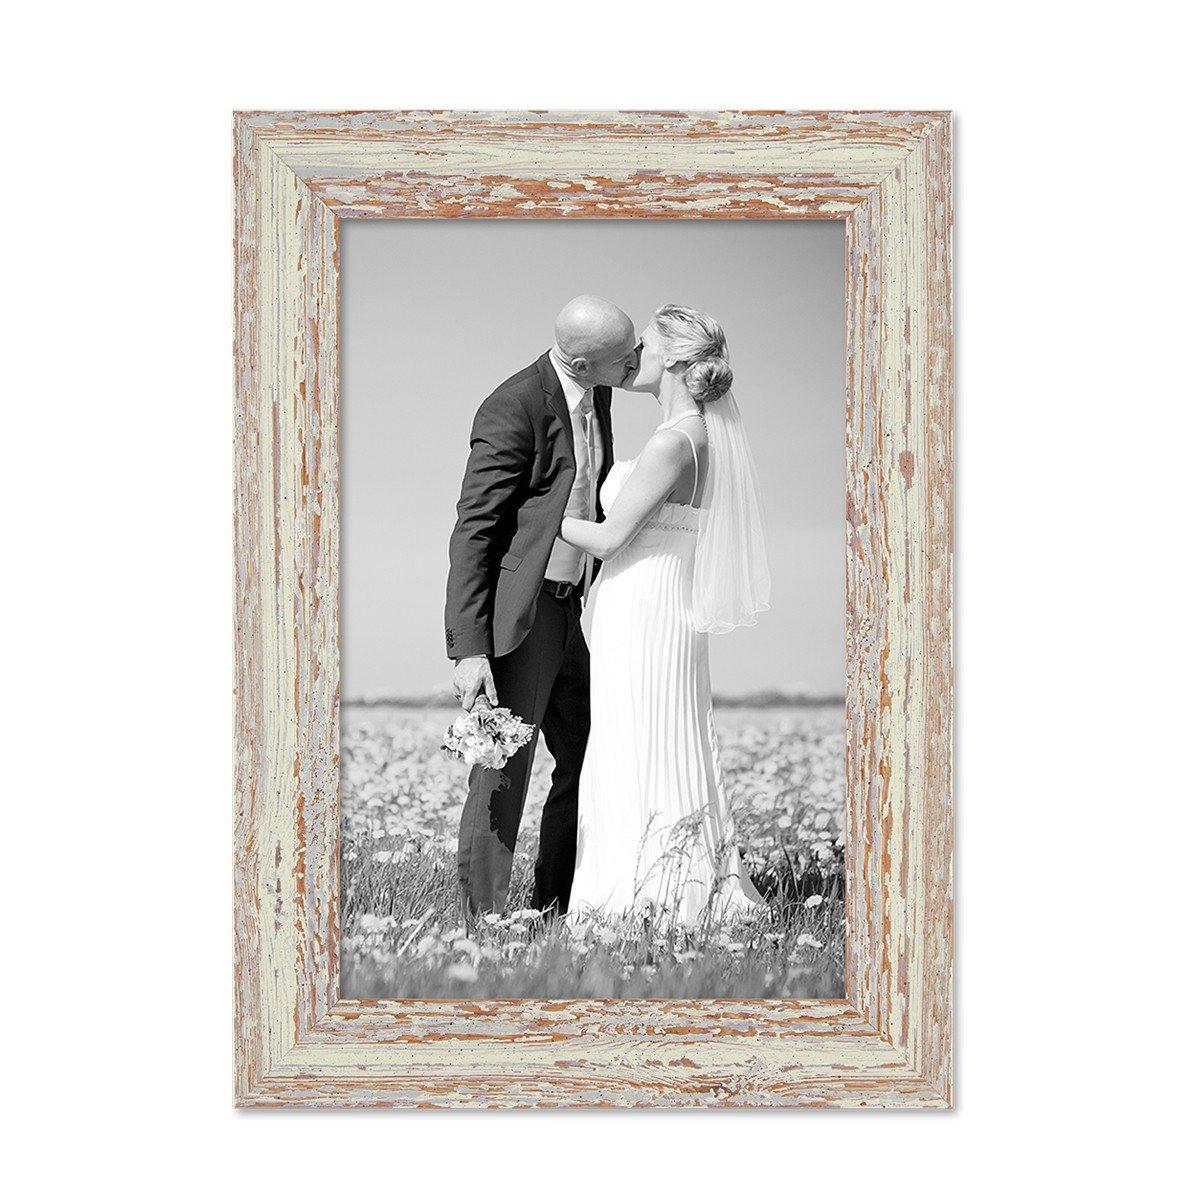 Amazon.de: Photolini Vintage Bilderrahmen 18x24 cm Weiss Shabby-Chic ...